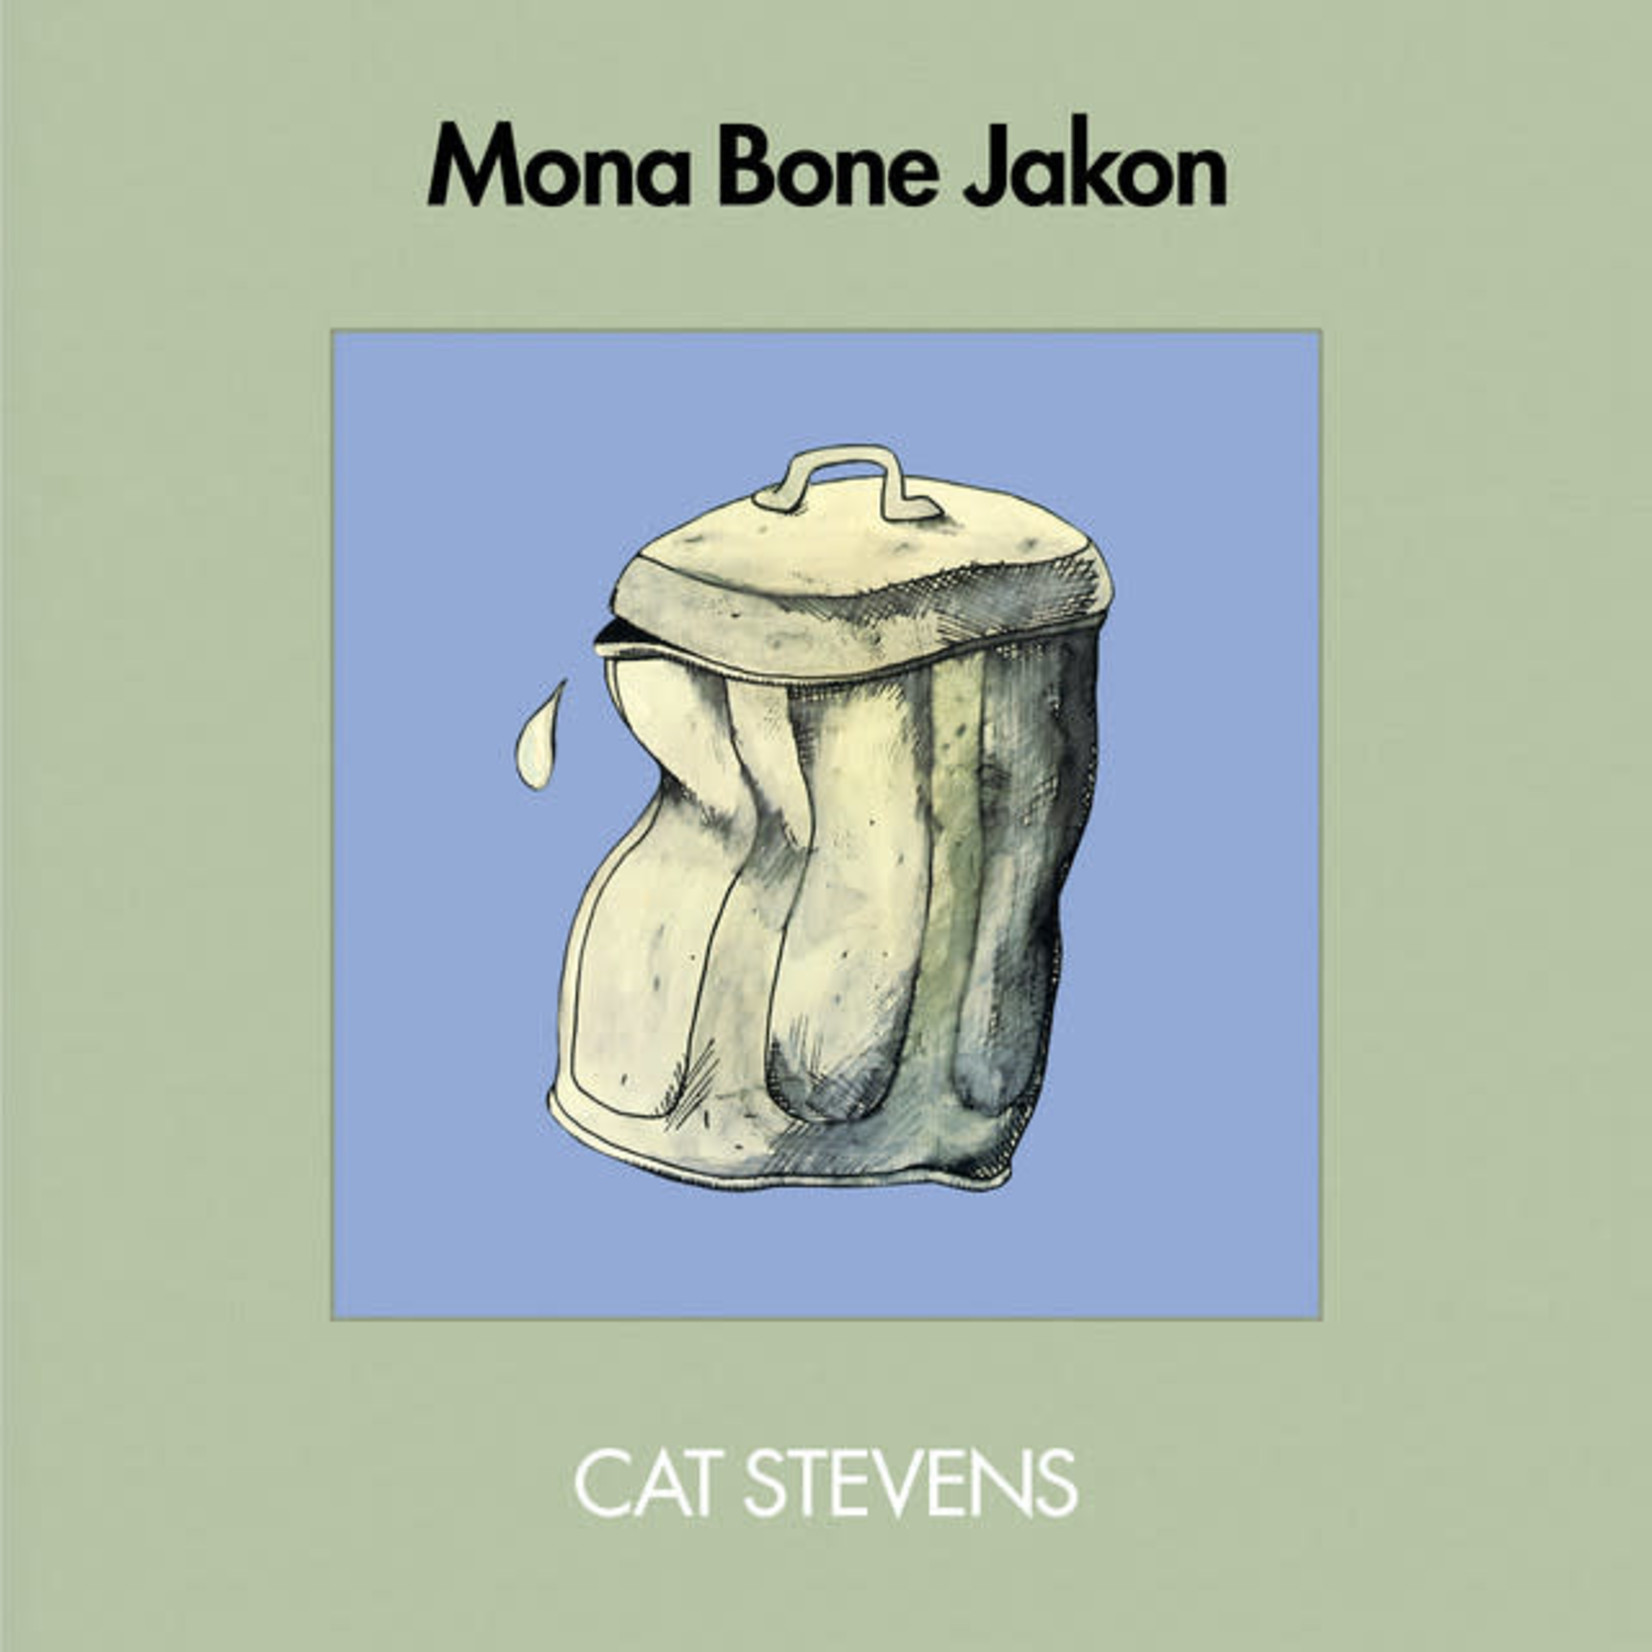 Vinyl Cat Stevens - Mona Bone Jakon (Half Speed Mastered)